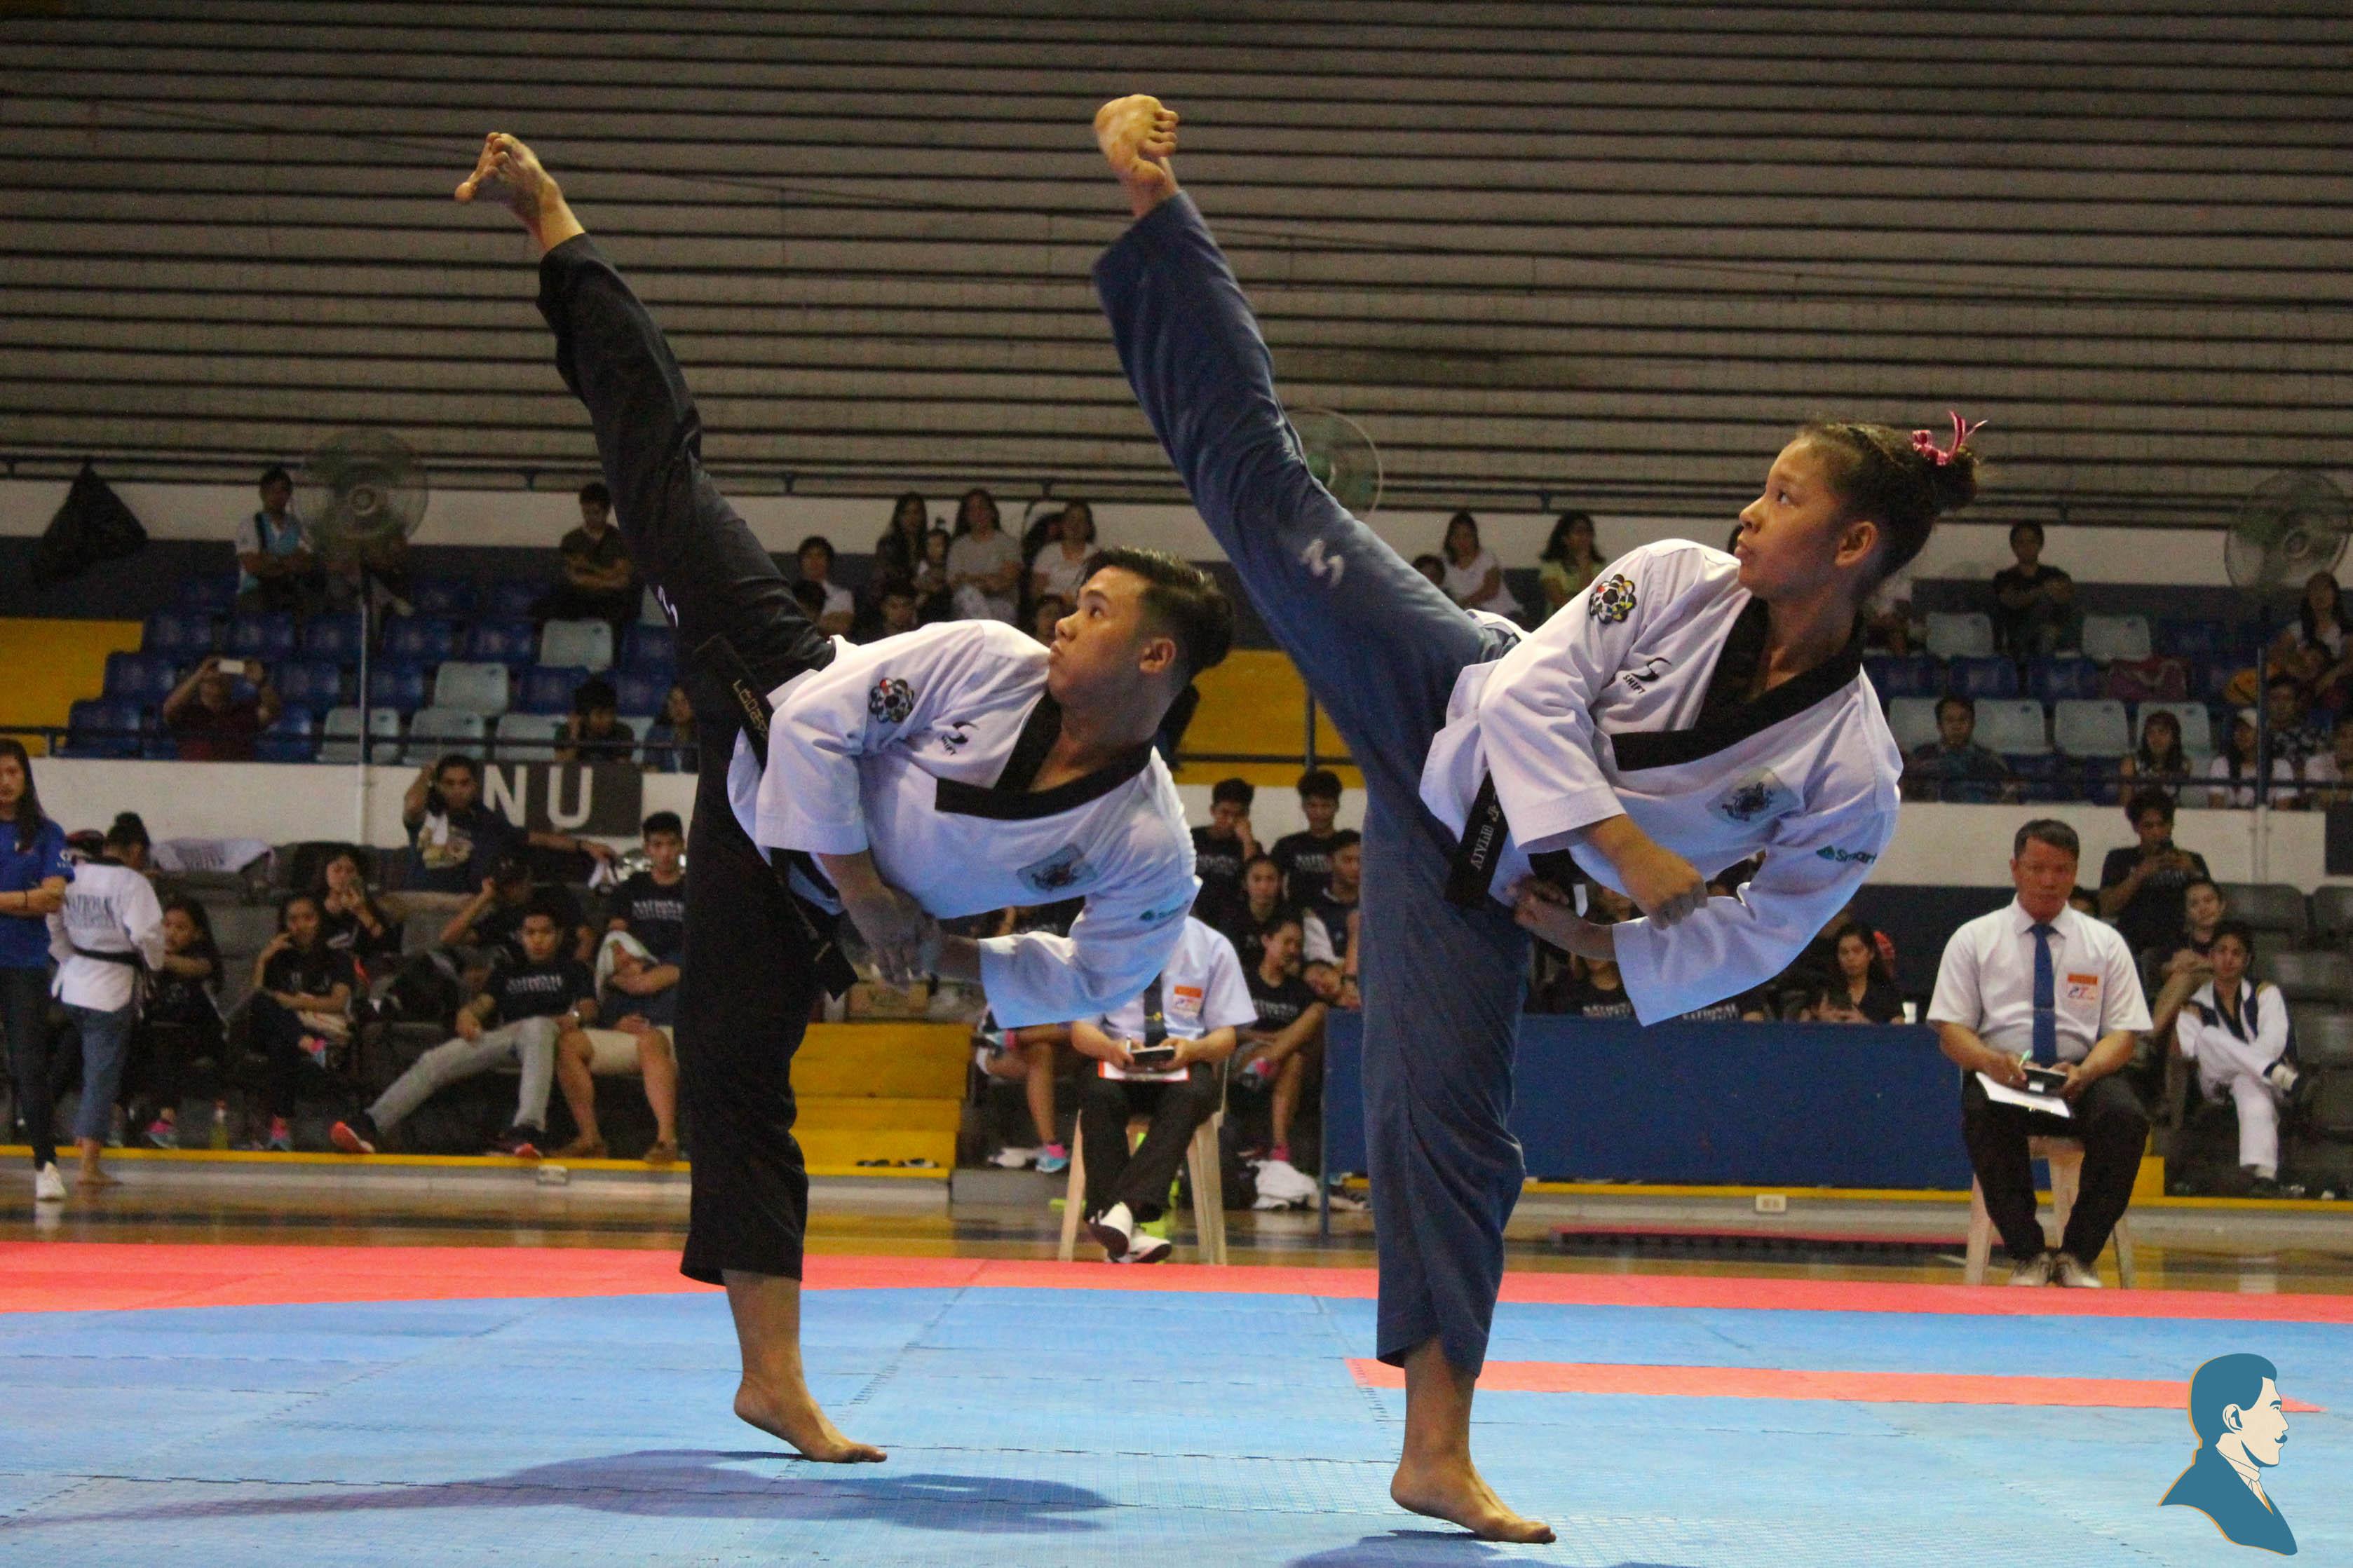 UP jins fall short of podium finish